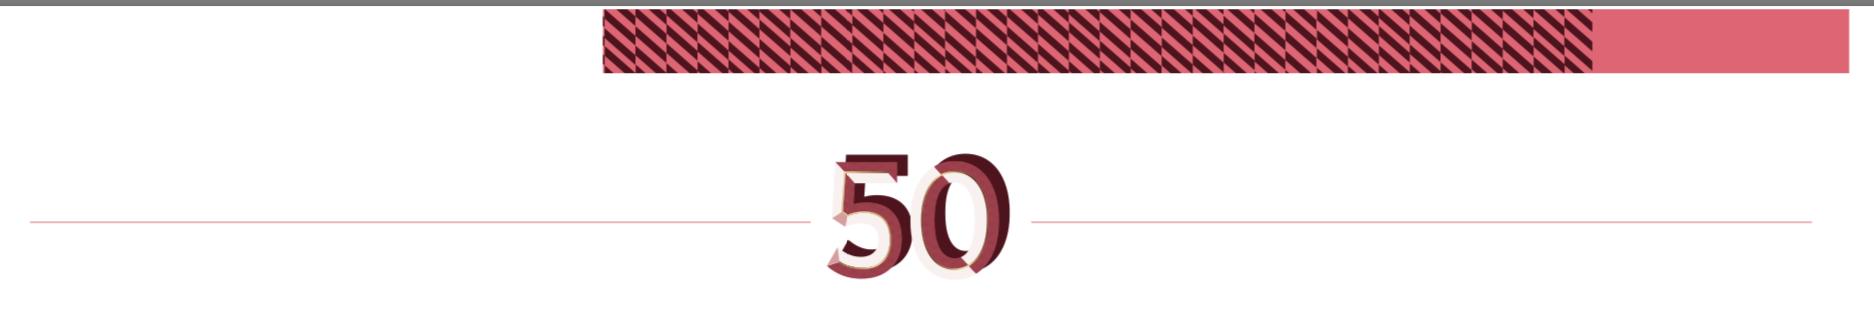 Rivet 50 denim Ian Berry jeans